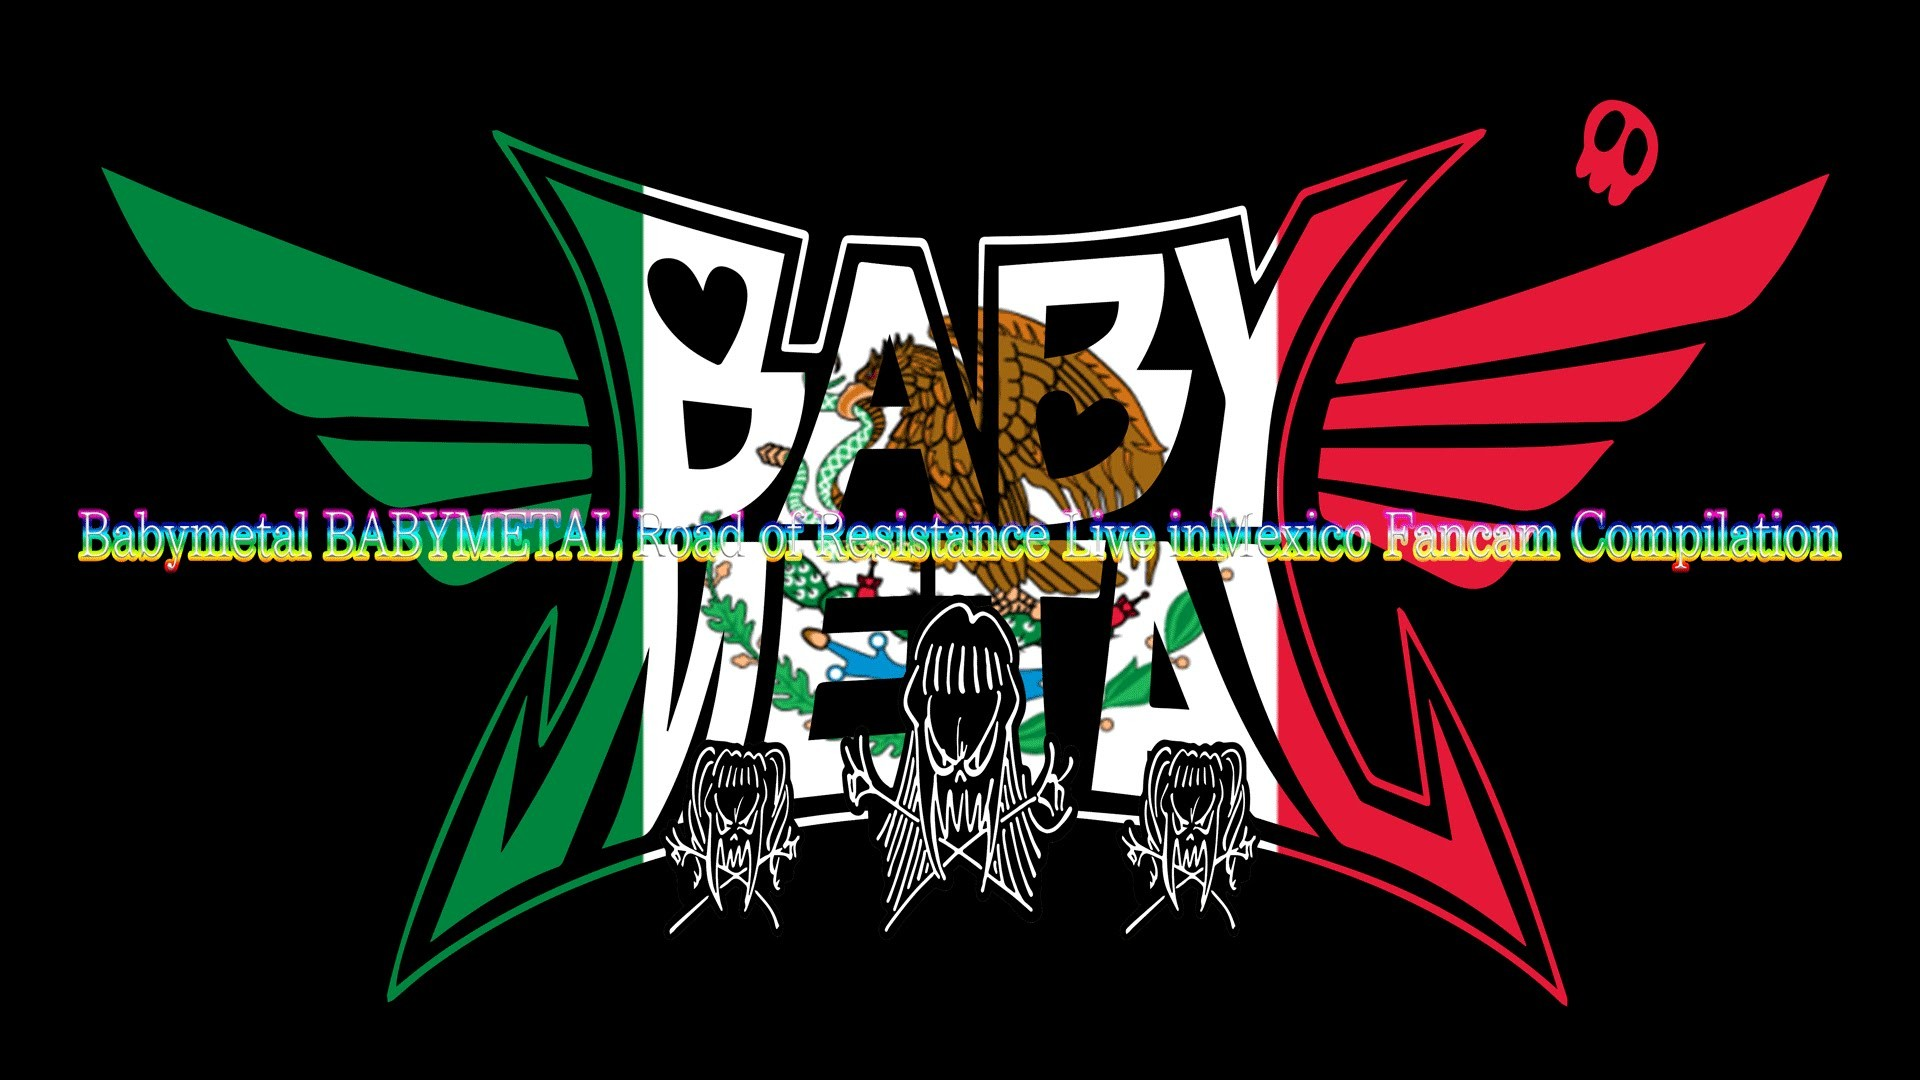 Babymetal BABYMETAL Road of Resistance Live inMexico Fancam Compilation